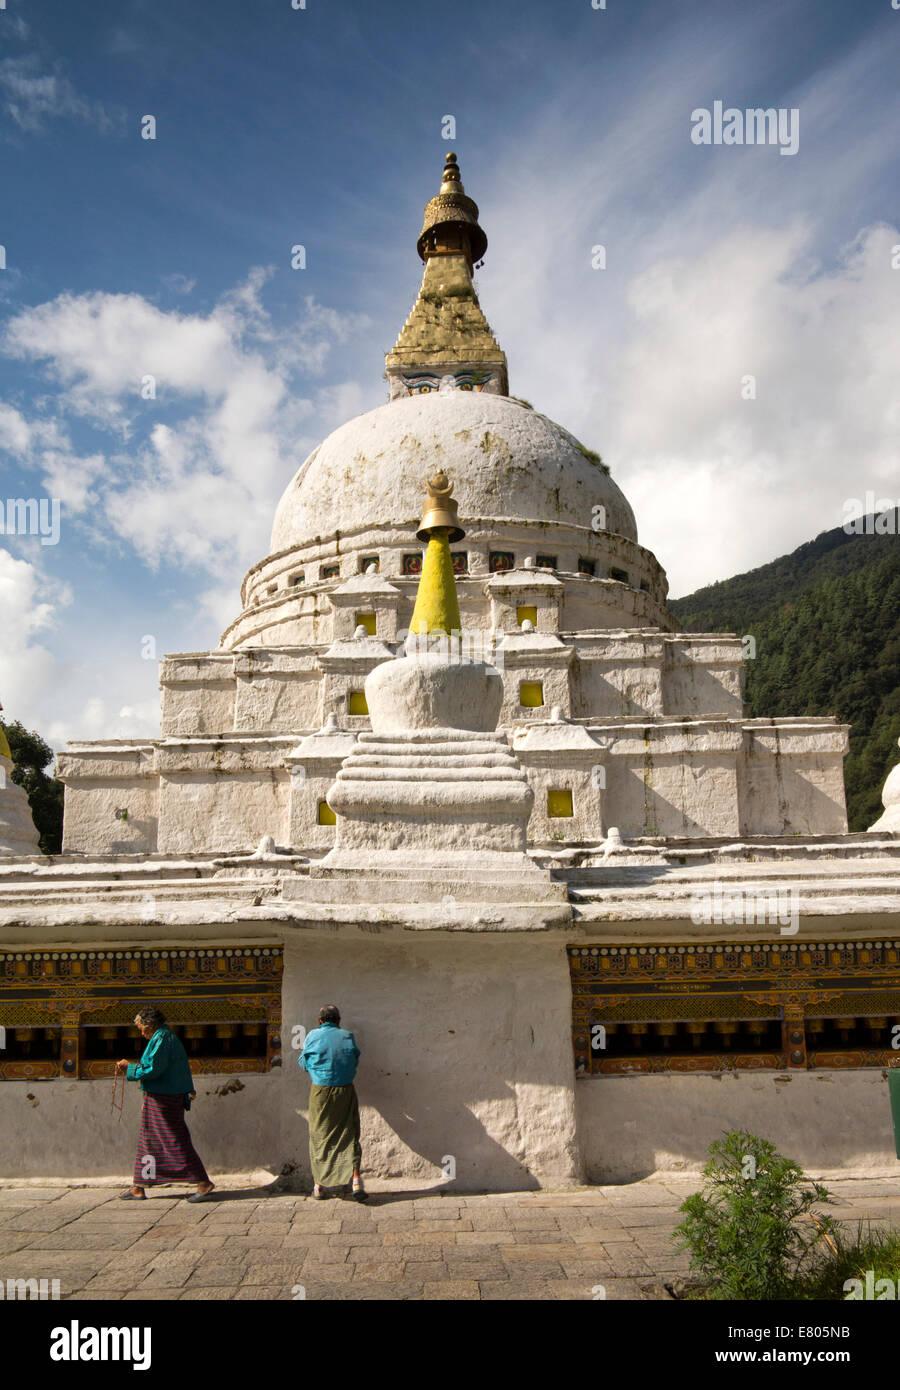 Eastern Bhutan, Trashi Yangtse, Chorten Kora, modelled on Bodhnath stupa in Nepal - Stock Image